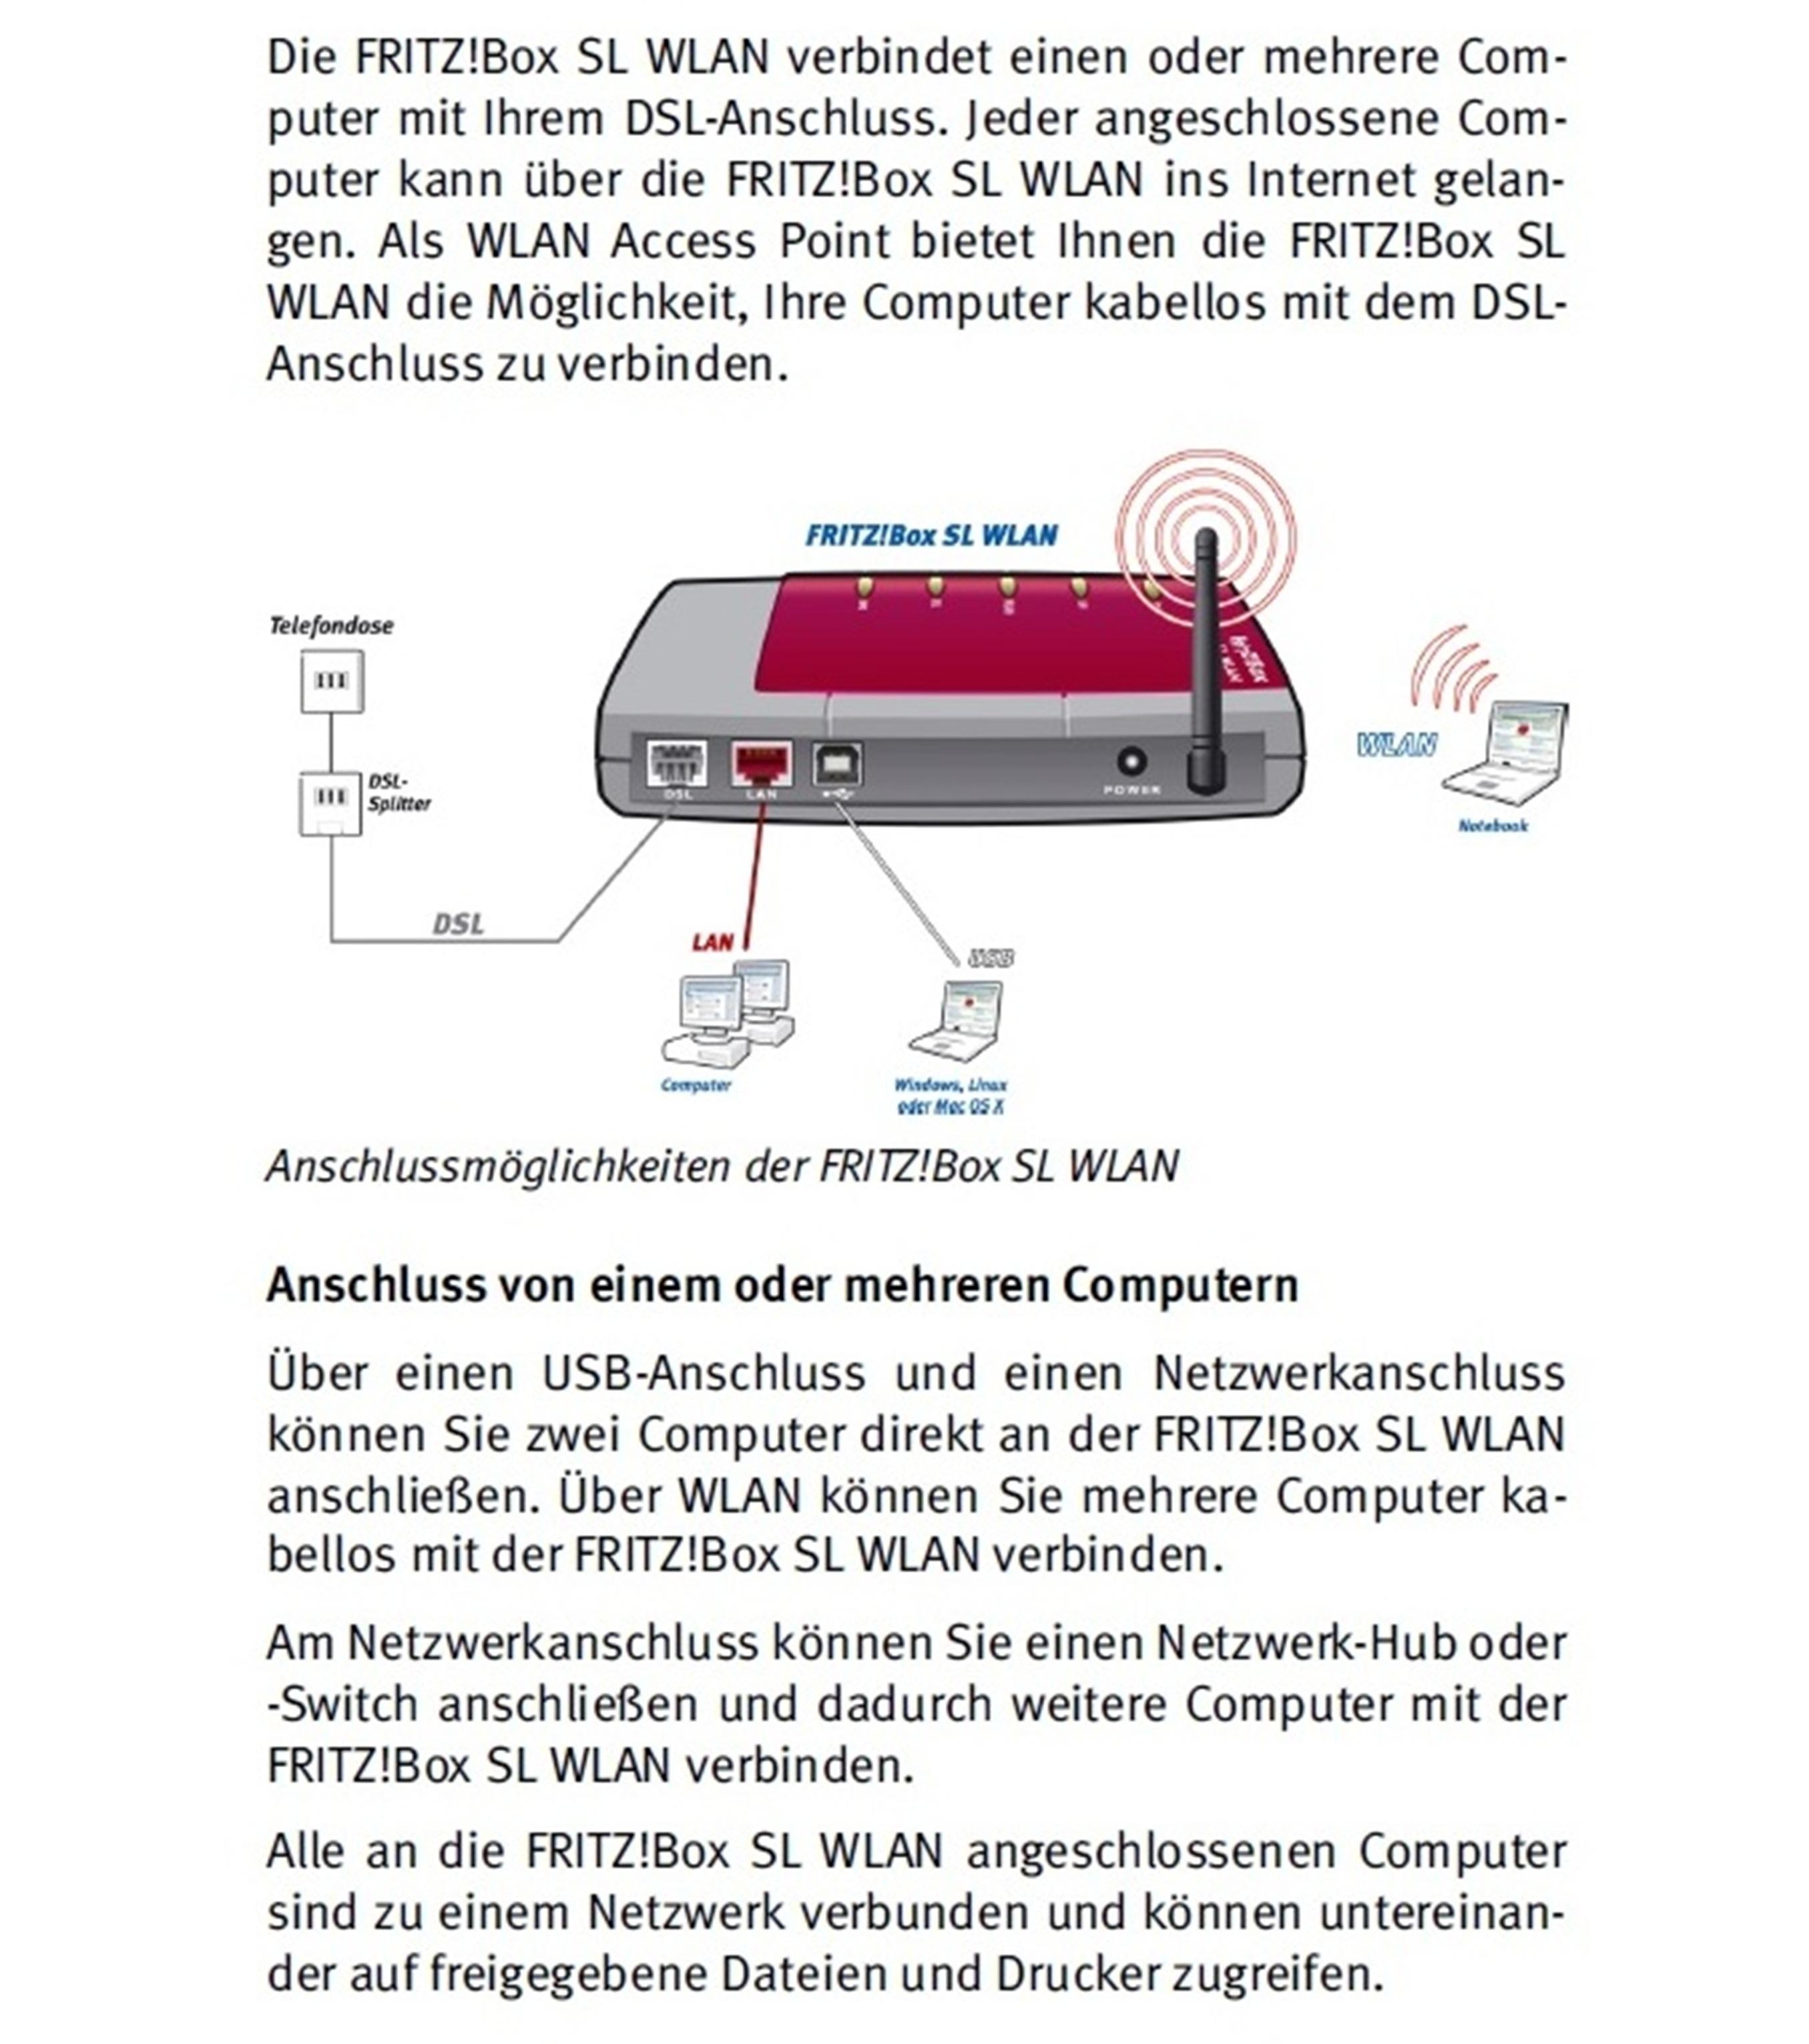 Avm fritz box sl wlan dsl modem und wlan router 16000 - Fritz box sl wlan ...